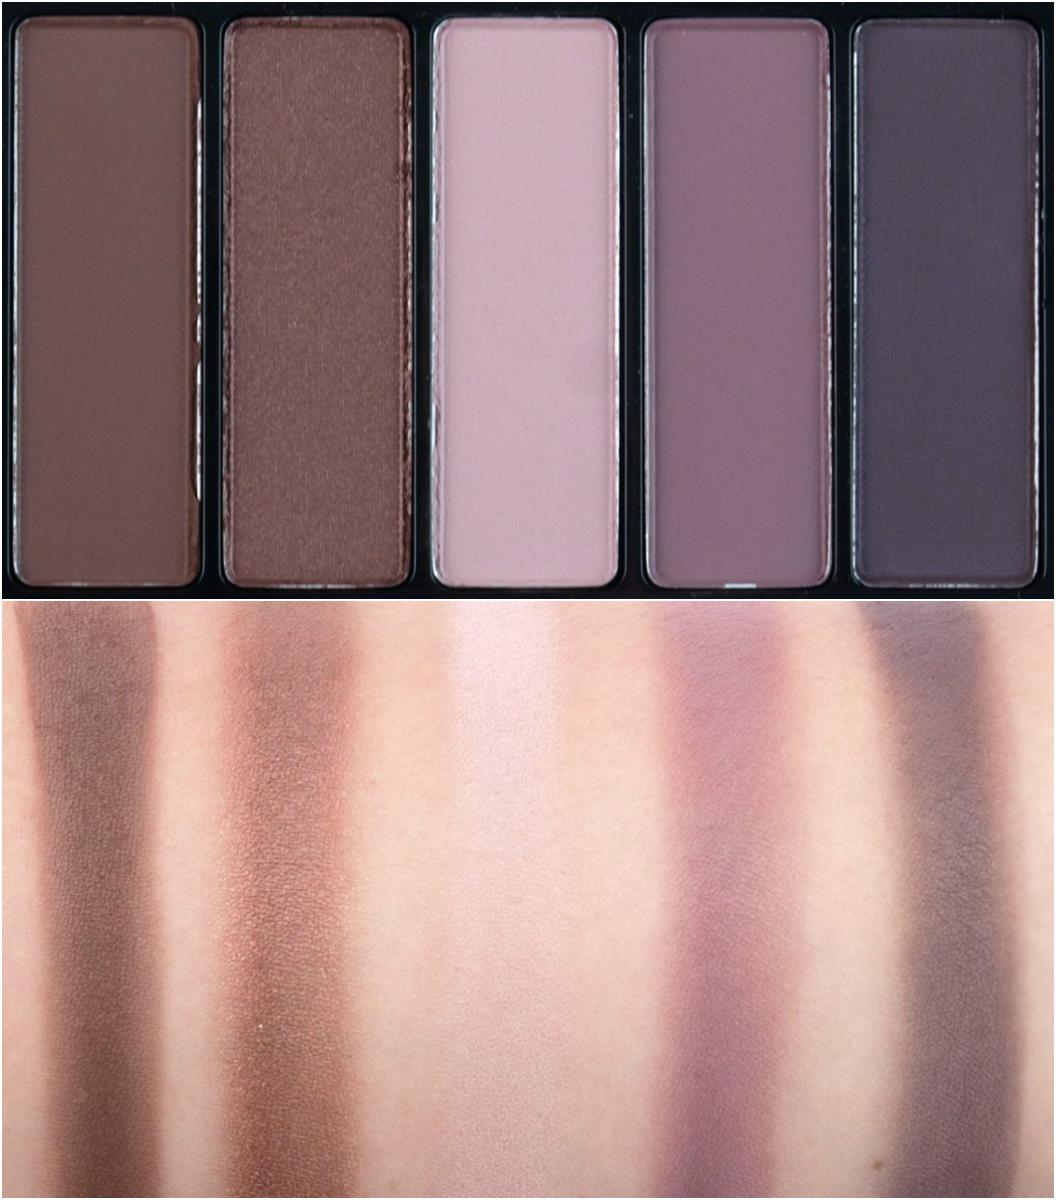 L'Oreal Paris Color Riche La Palette Nude 2 Eyeshadow Palette: Review and Swatches